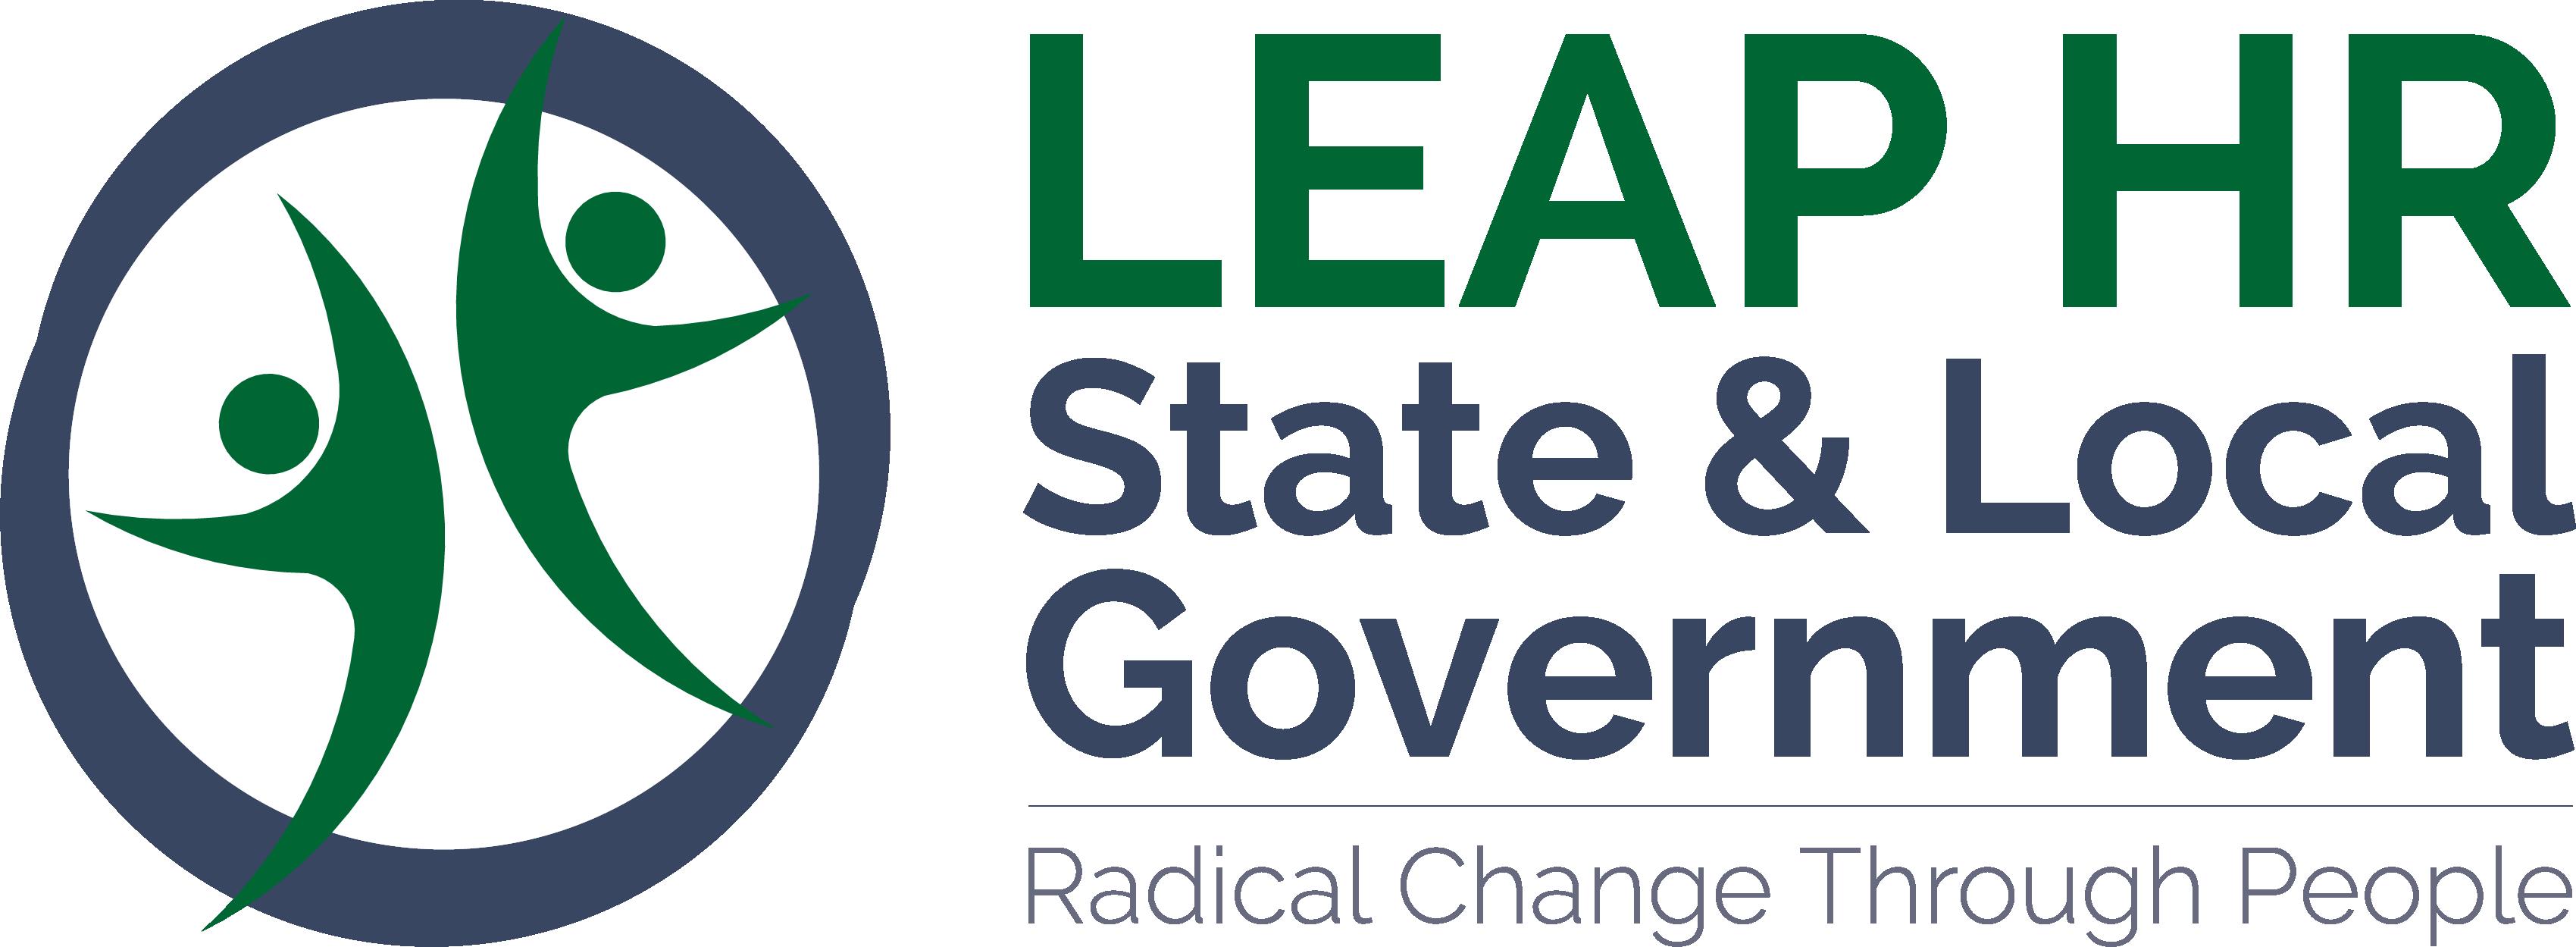 HW210713 LEAP HR Government logo 2021 FINAL